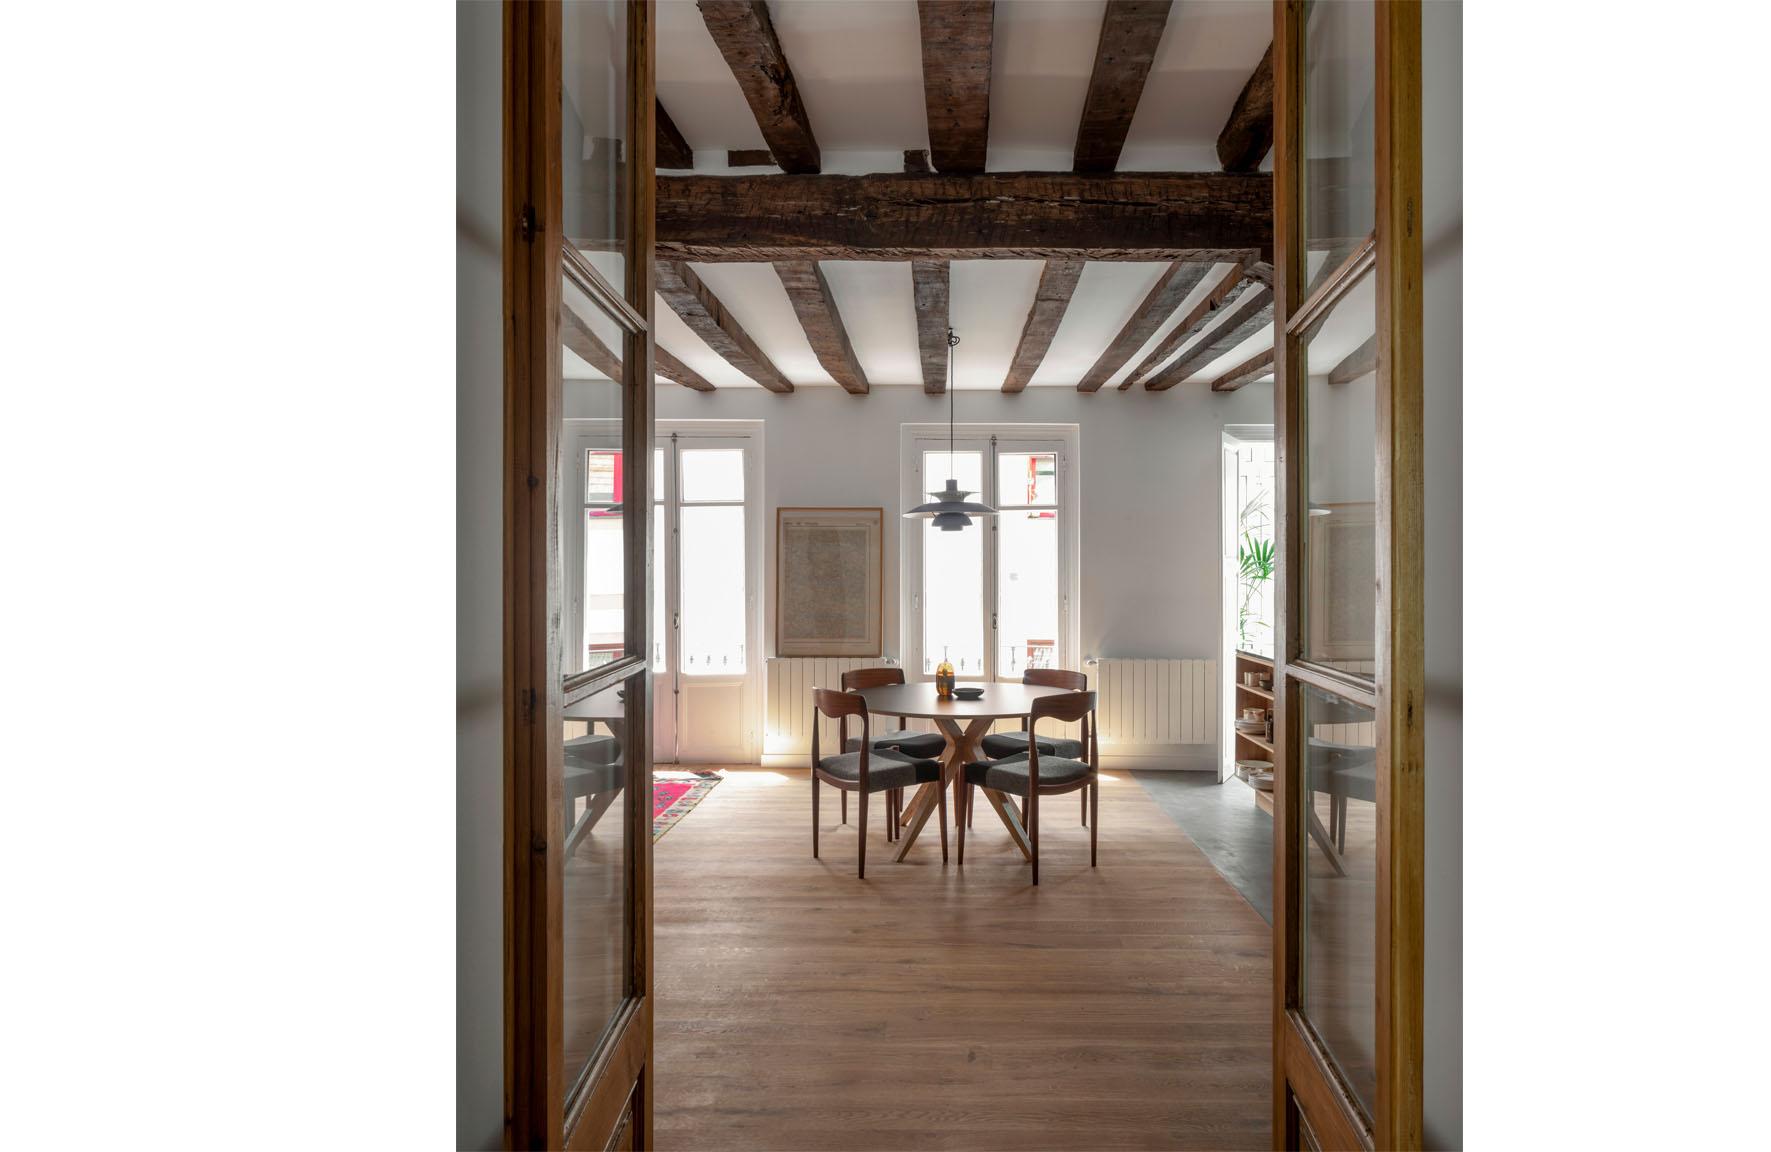 Apartment Esperanza-Bilbao-Image 01.jpg